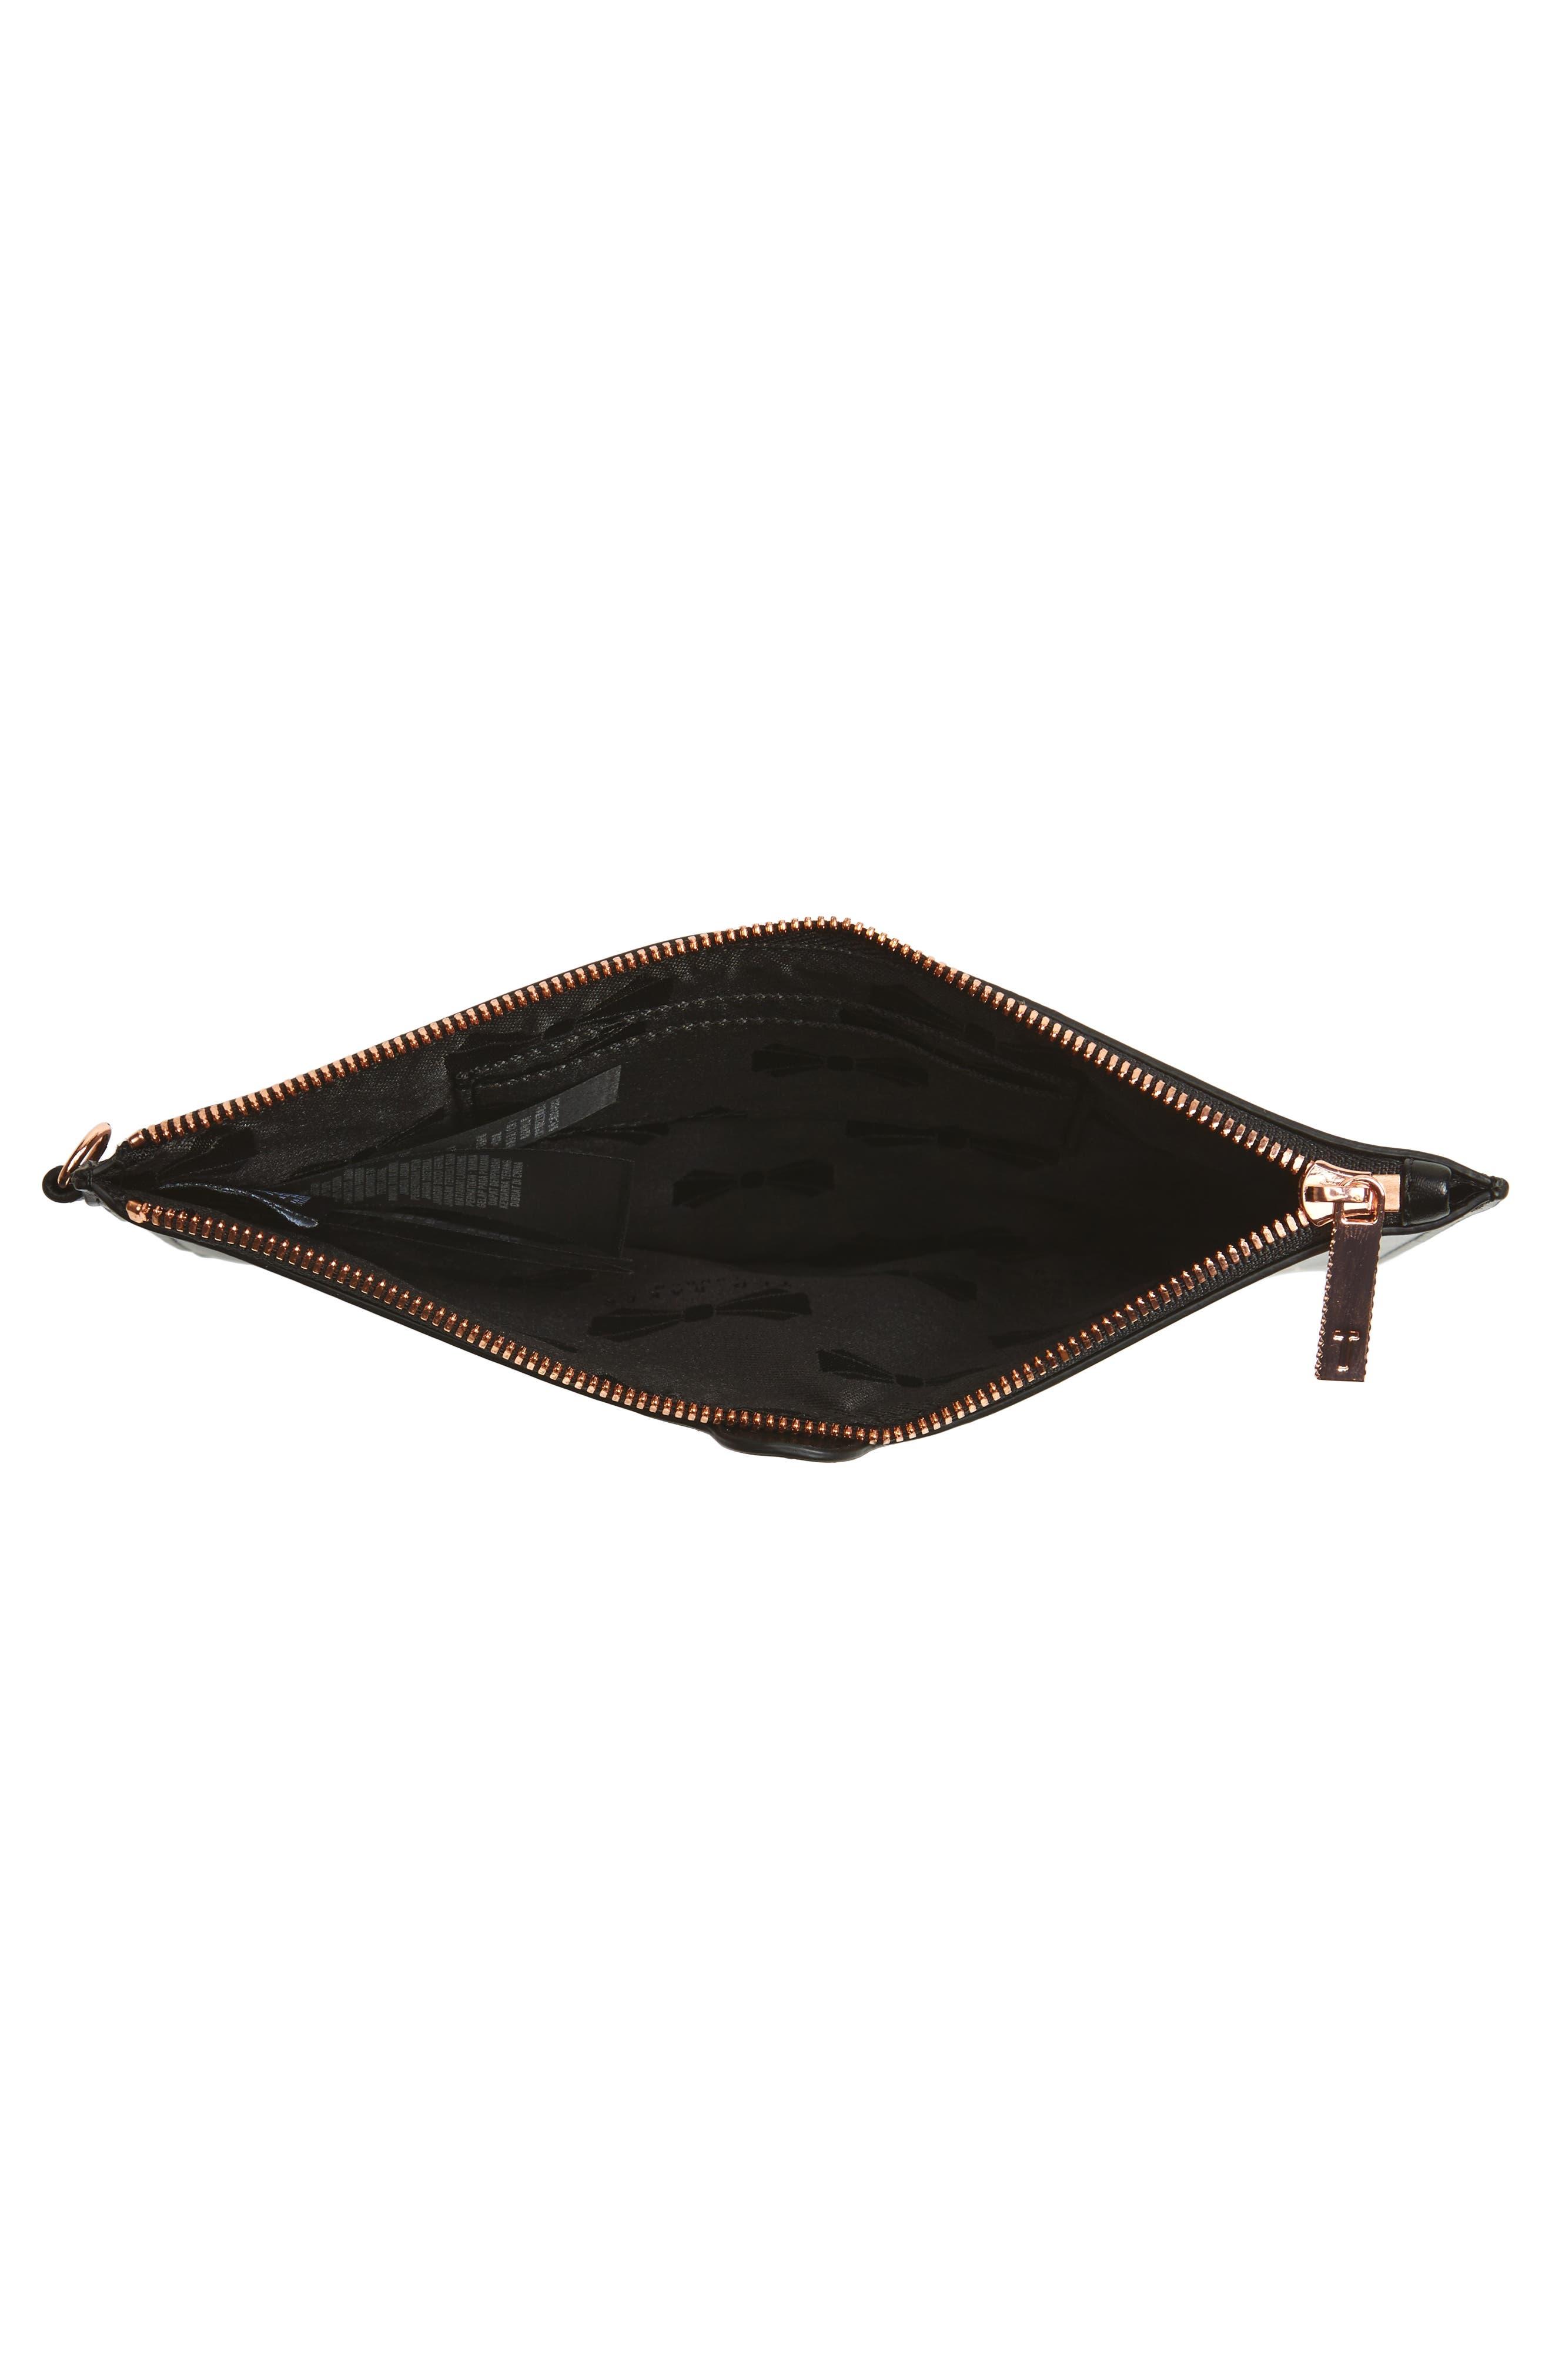 Barker Leather Pouch,                             Alternate thumbnail 4, color,                             Black